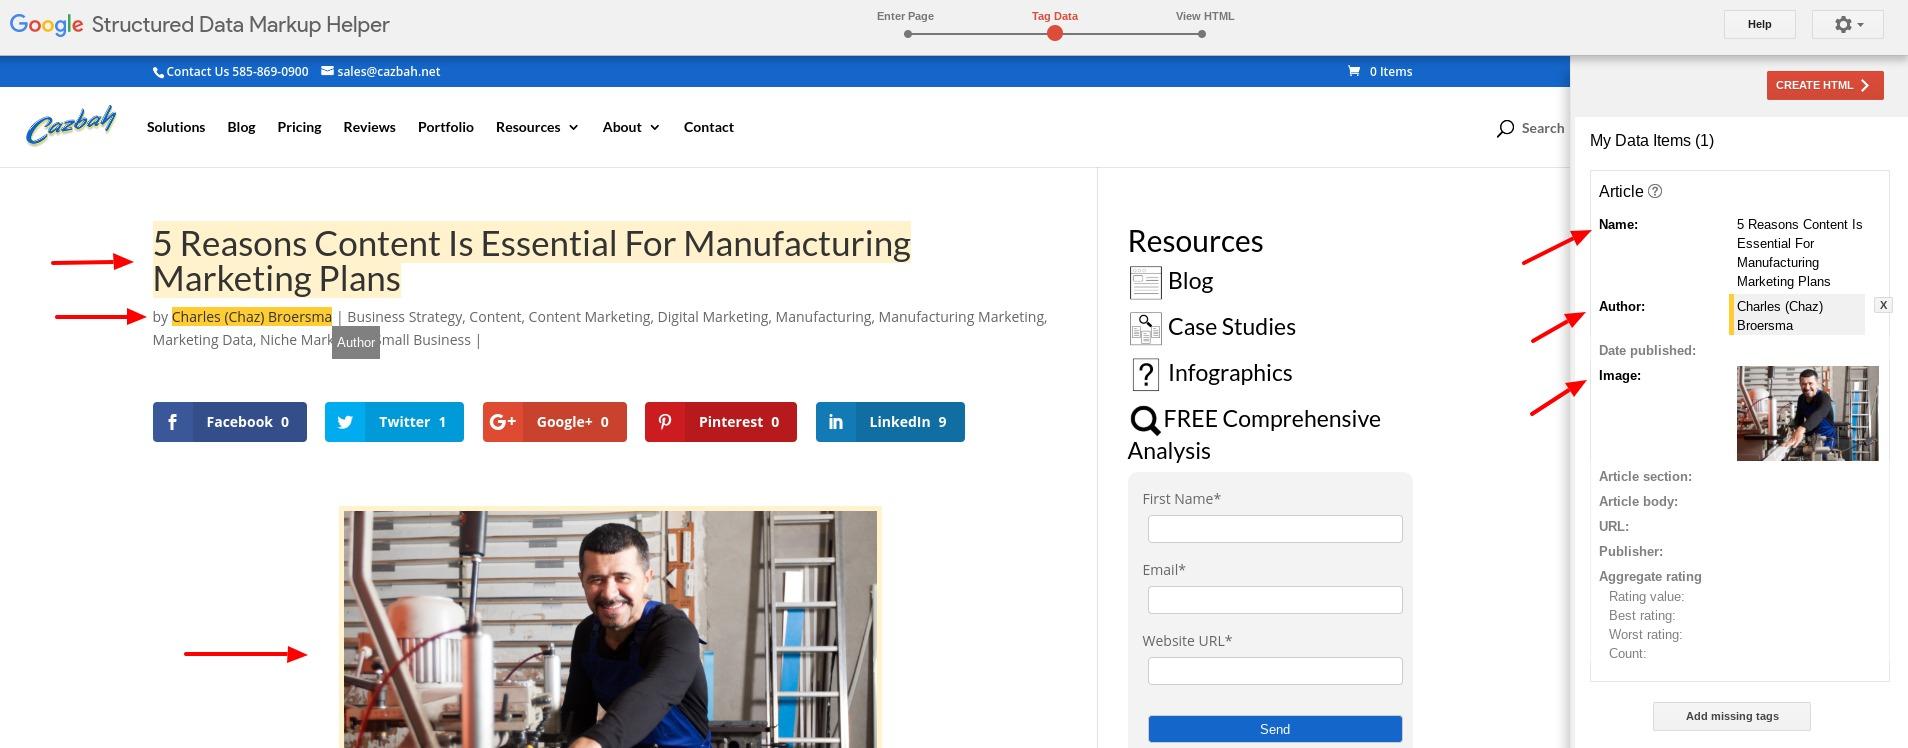 Google Schema Markup Tool Tutprial